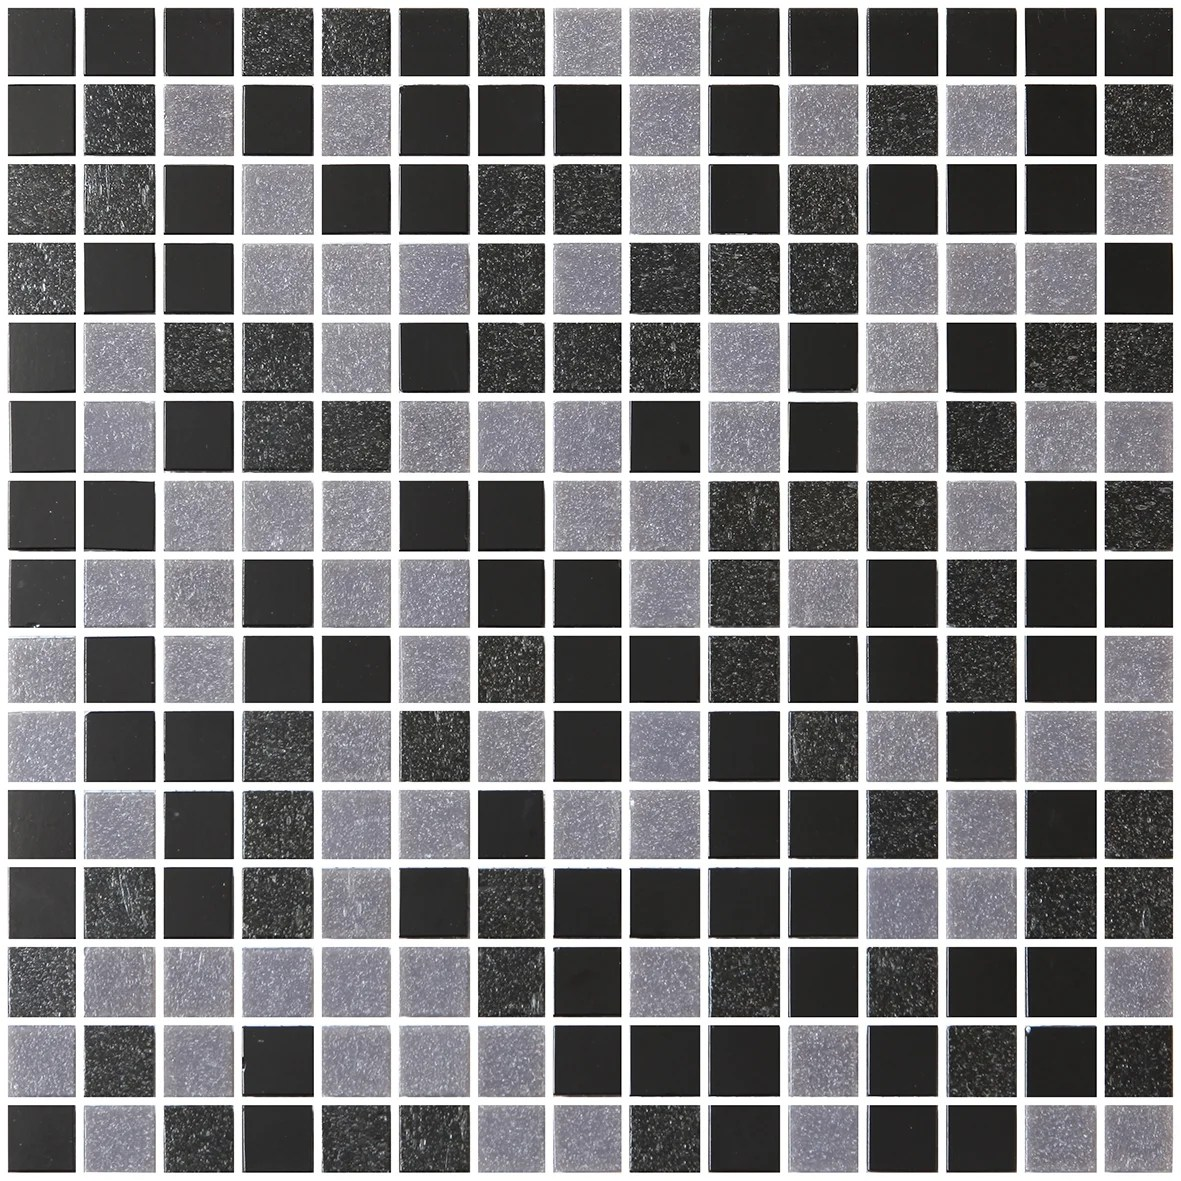 Mosaique Mur Pool Noir 32 7 X 32 7 Cm Leroy Merlin